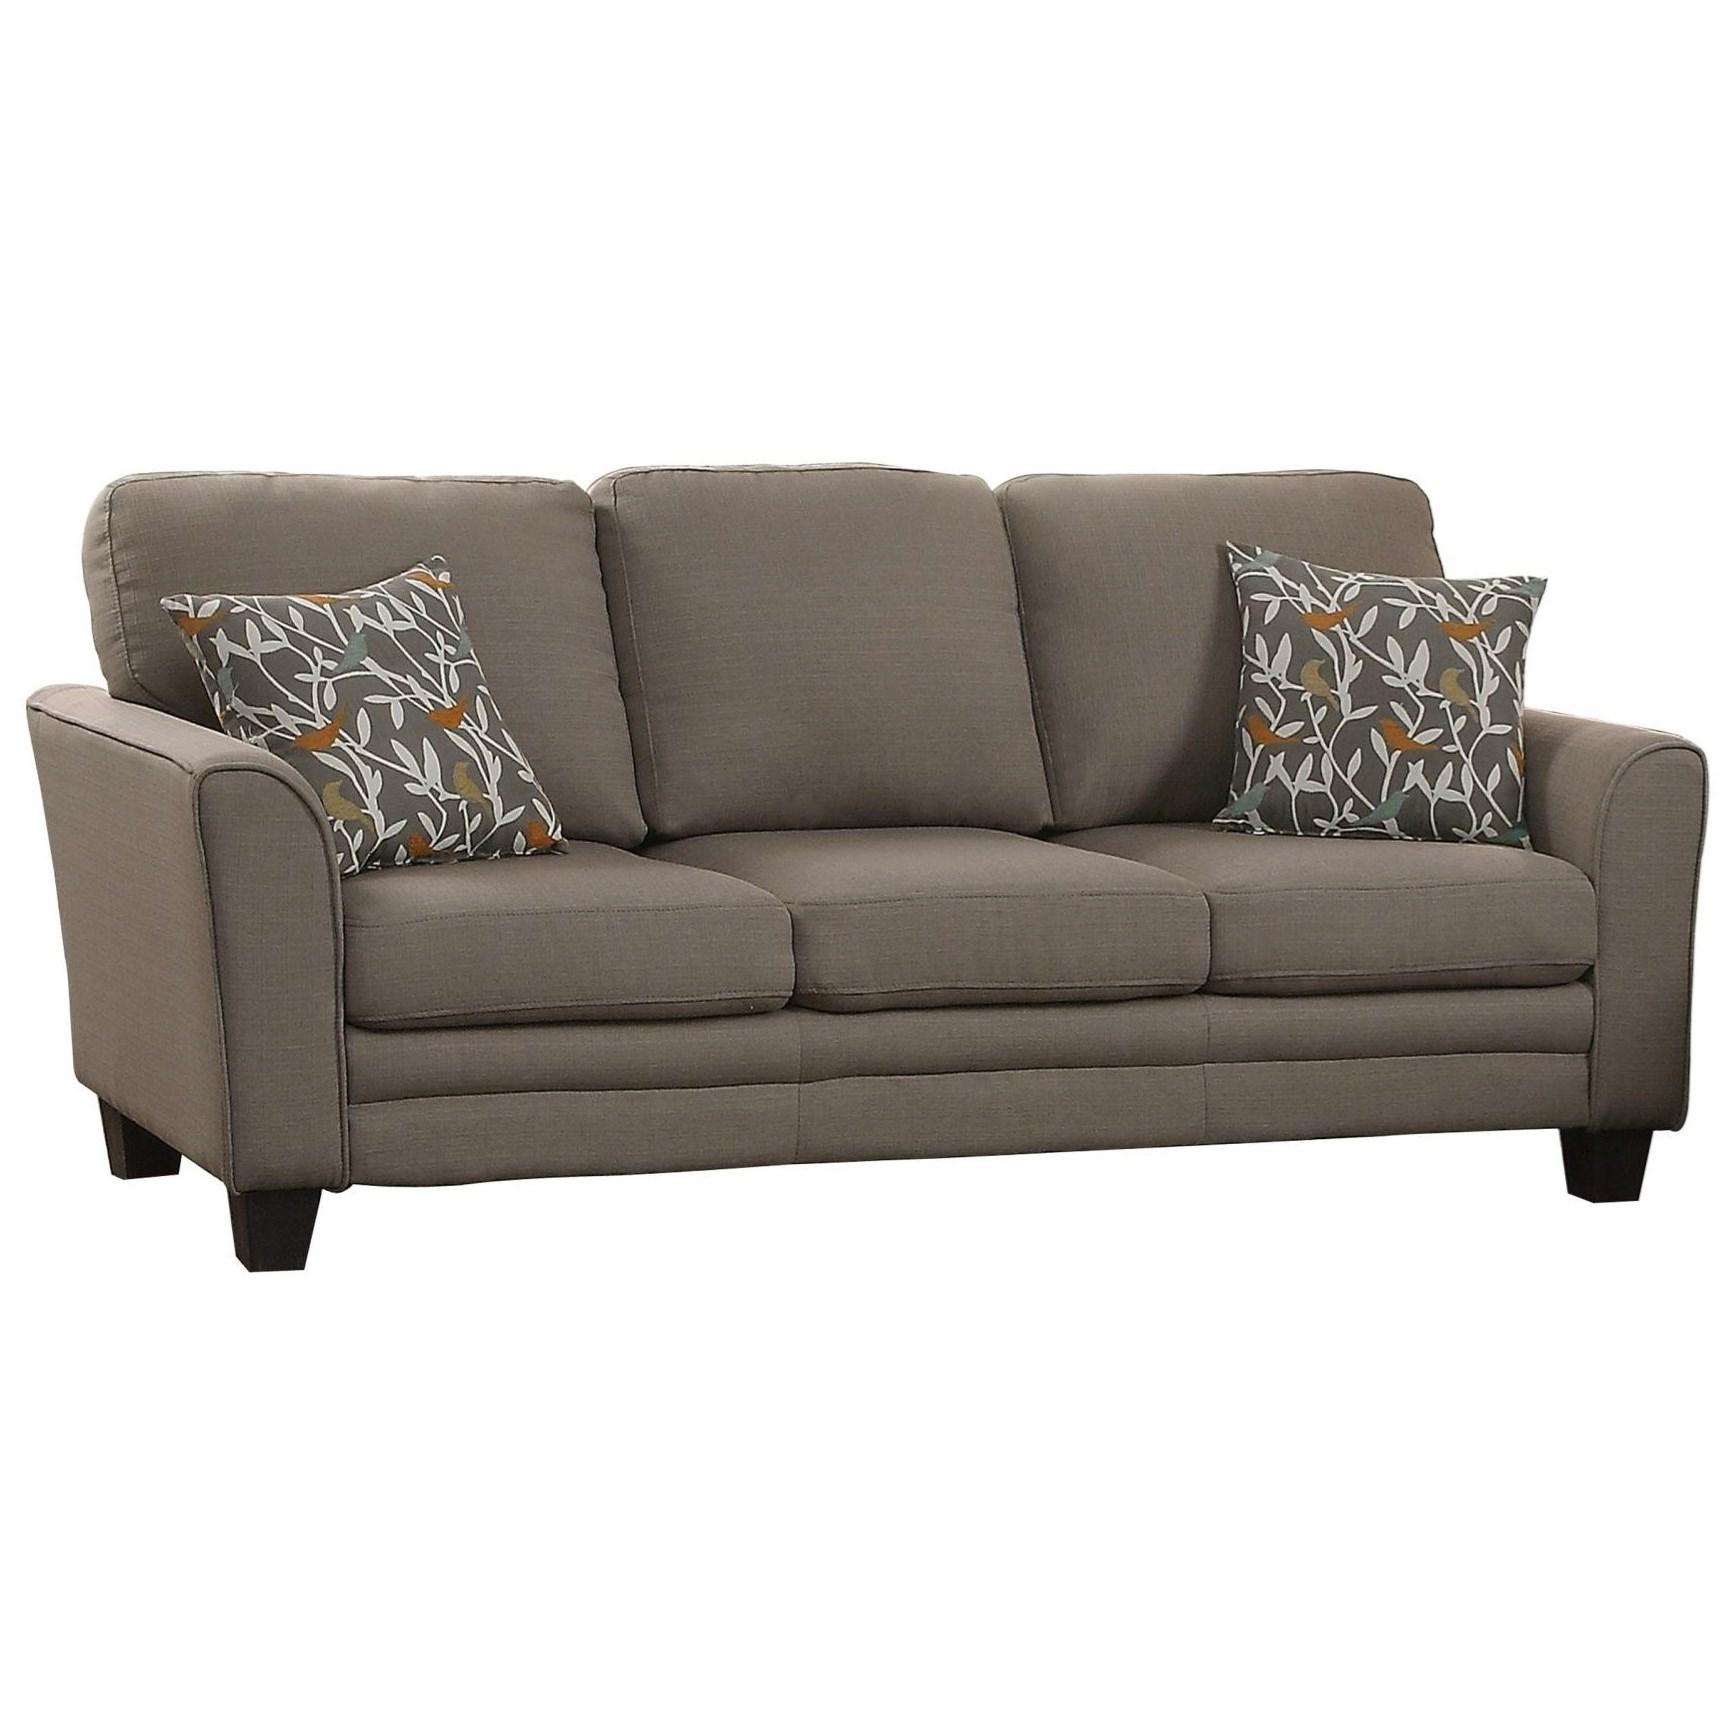 Adair Sofa by Homelegance at Value City Furniture